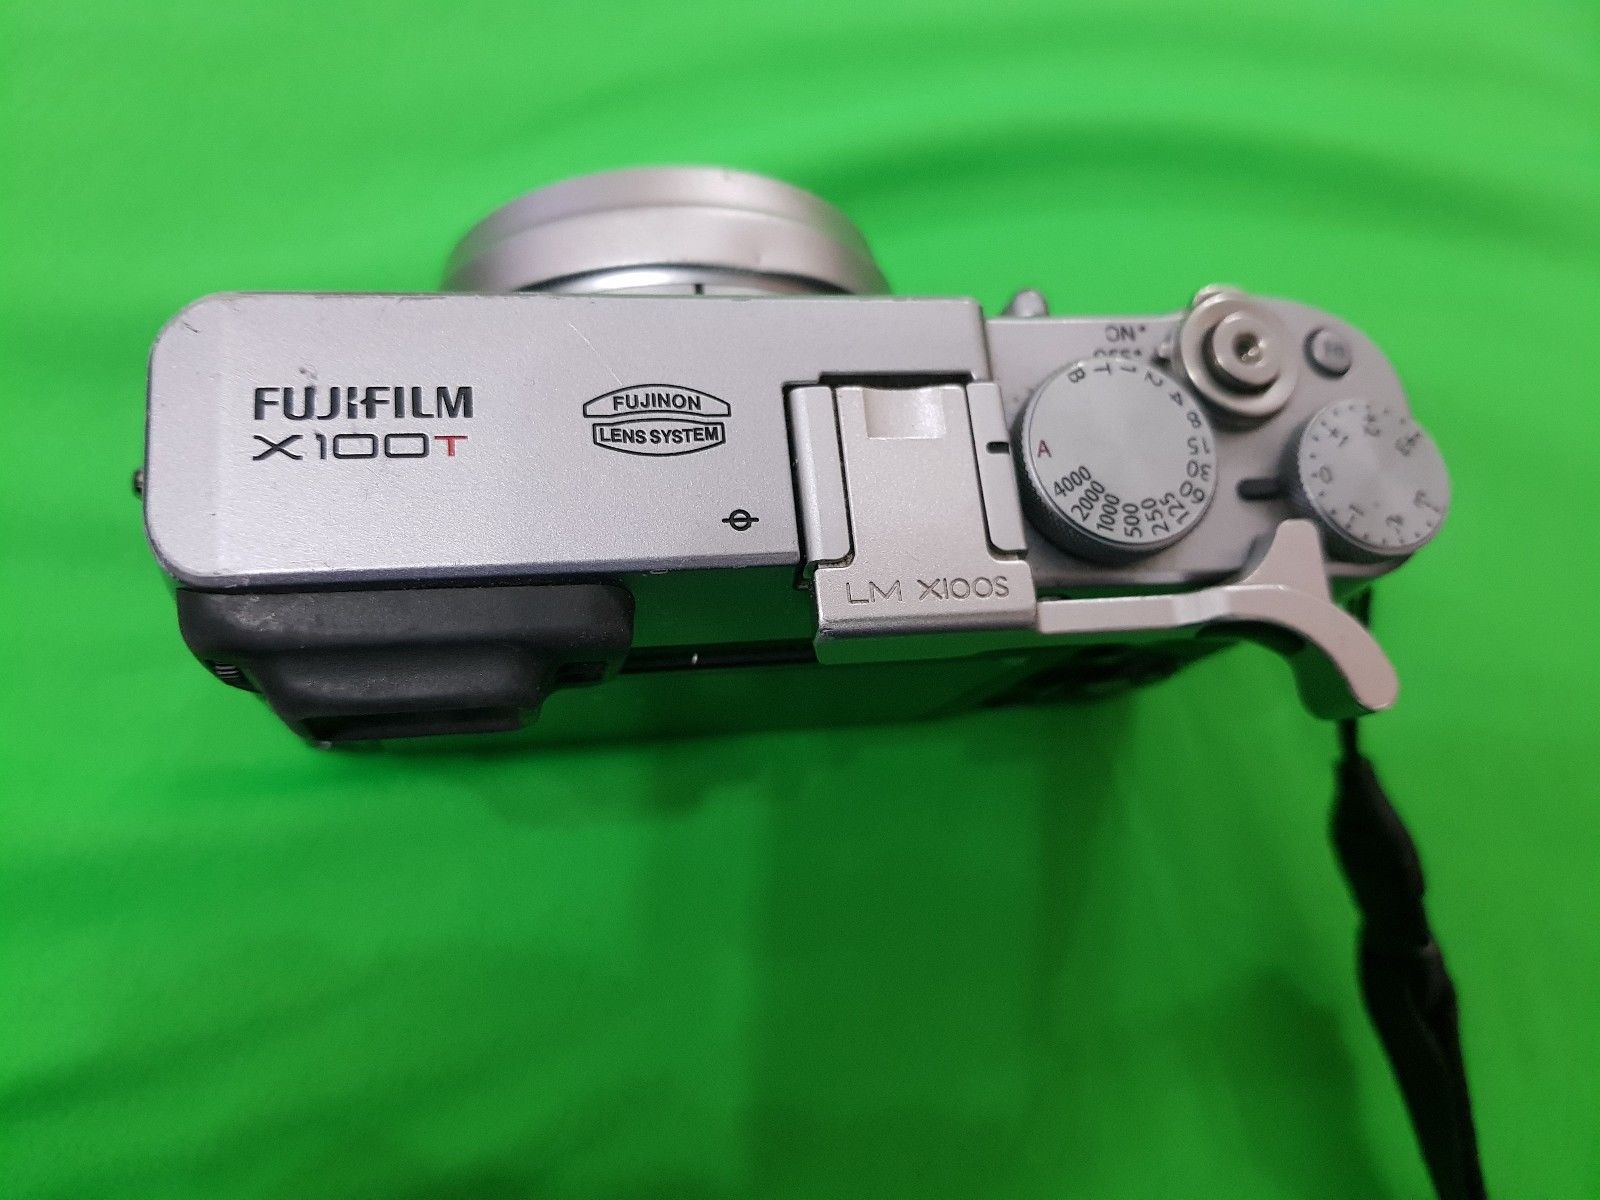 Fuji Fujifilm  X100T 16.3 MP Digitalkamera